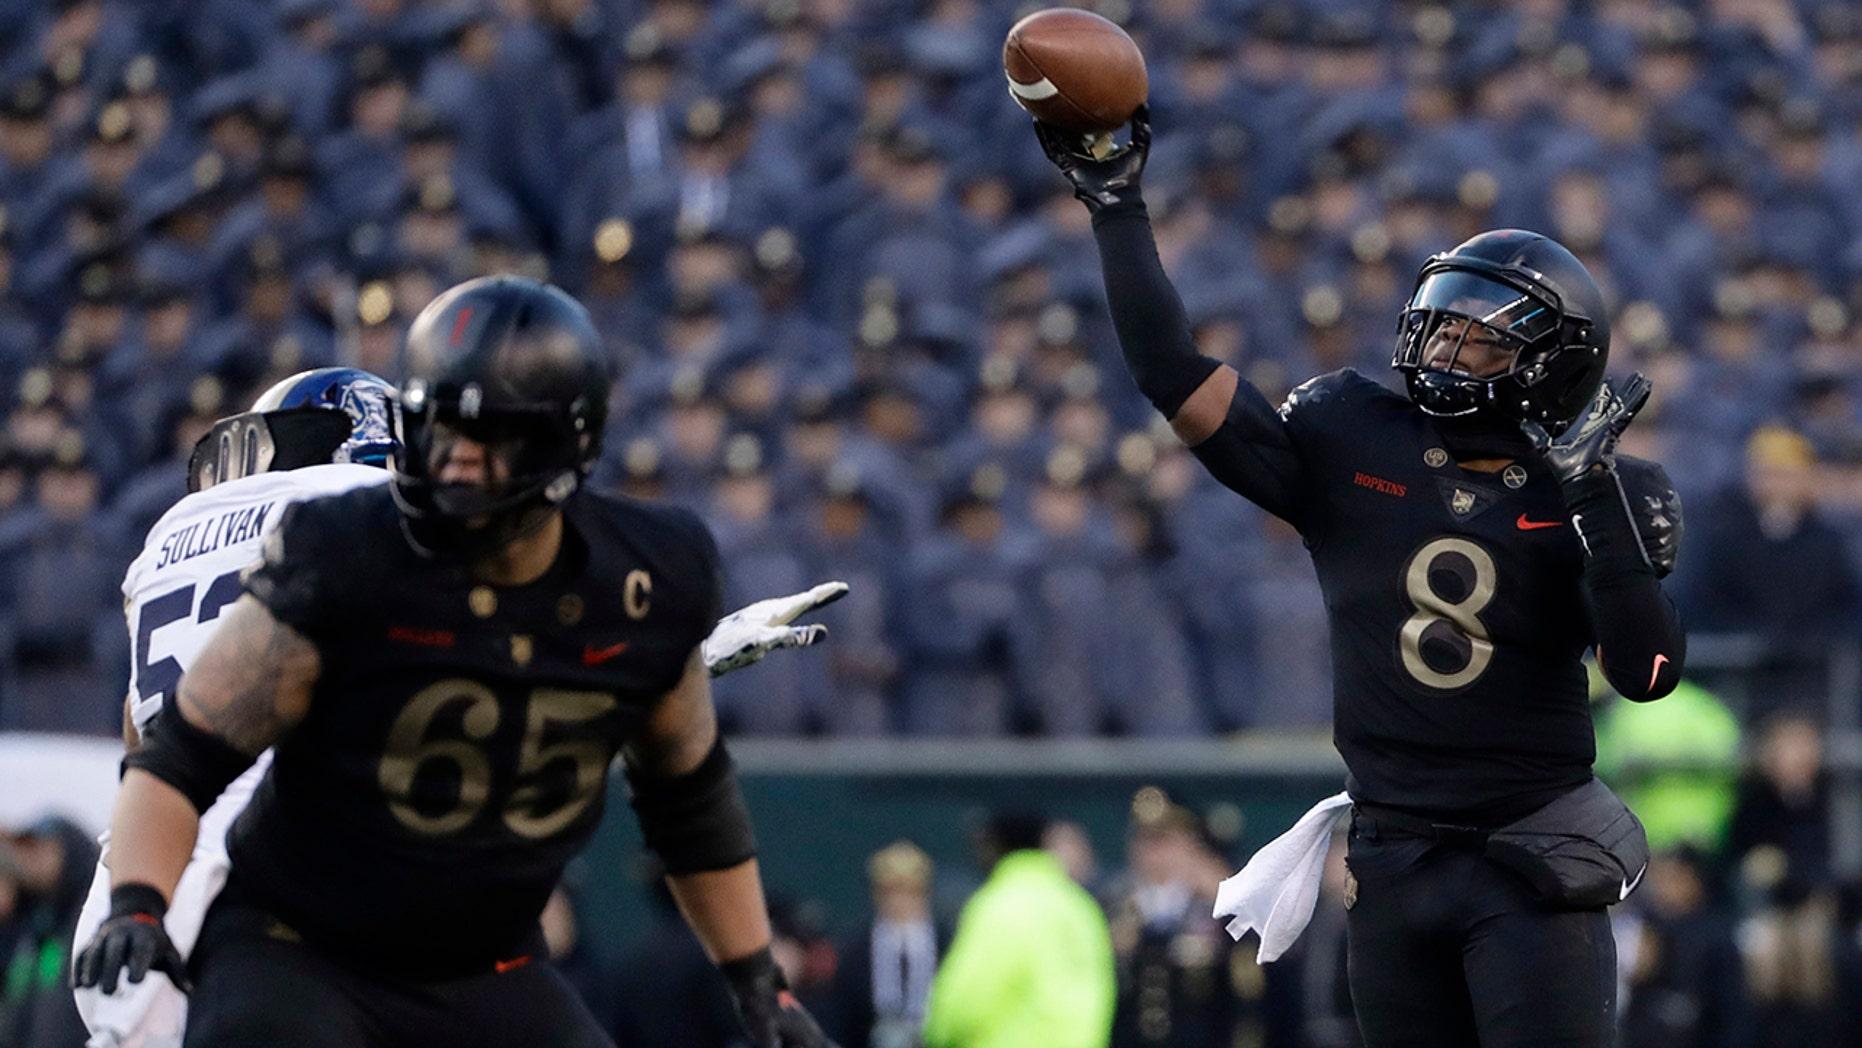 Army's Kelvin Hopkins Jr. throws a pass during the first half of an NCAA college football game against Navy, Saturday, Dec. 8, 2018, in Philadelphia. (AP Photo/Matt Slocum)